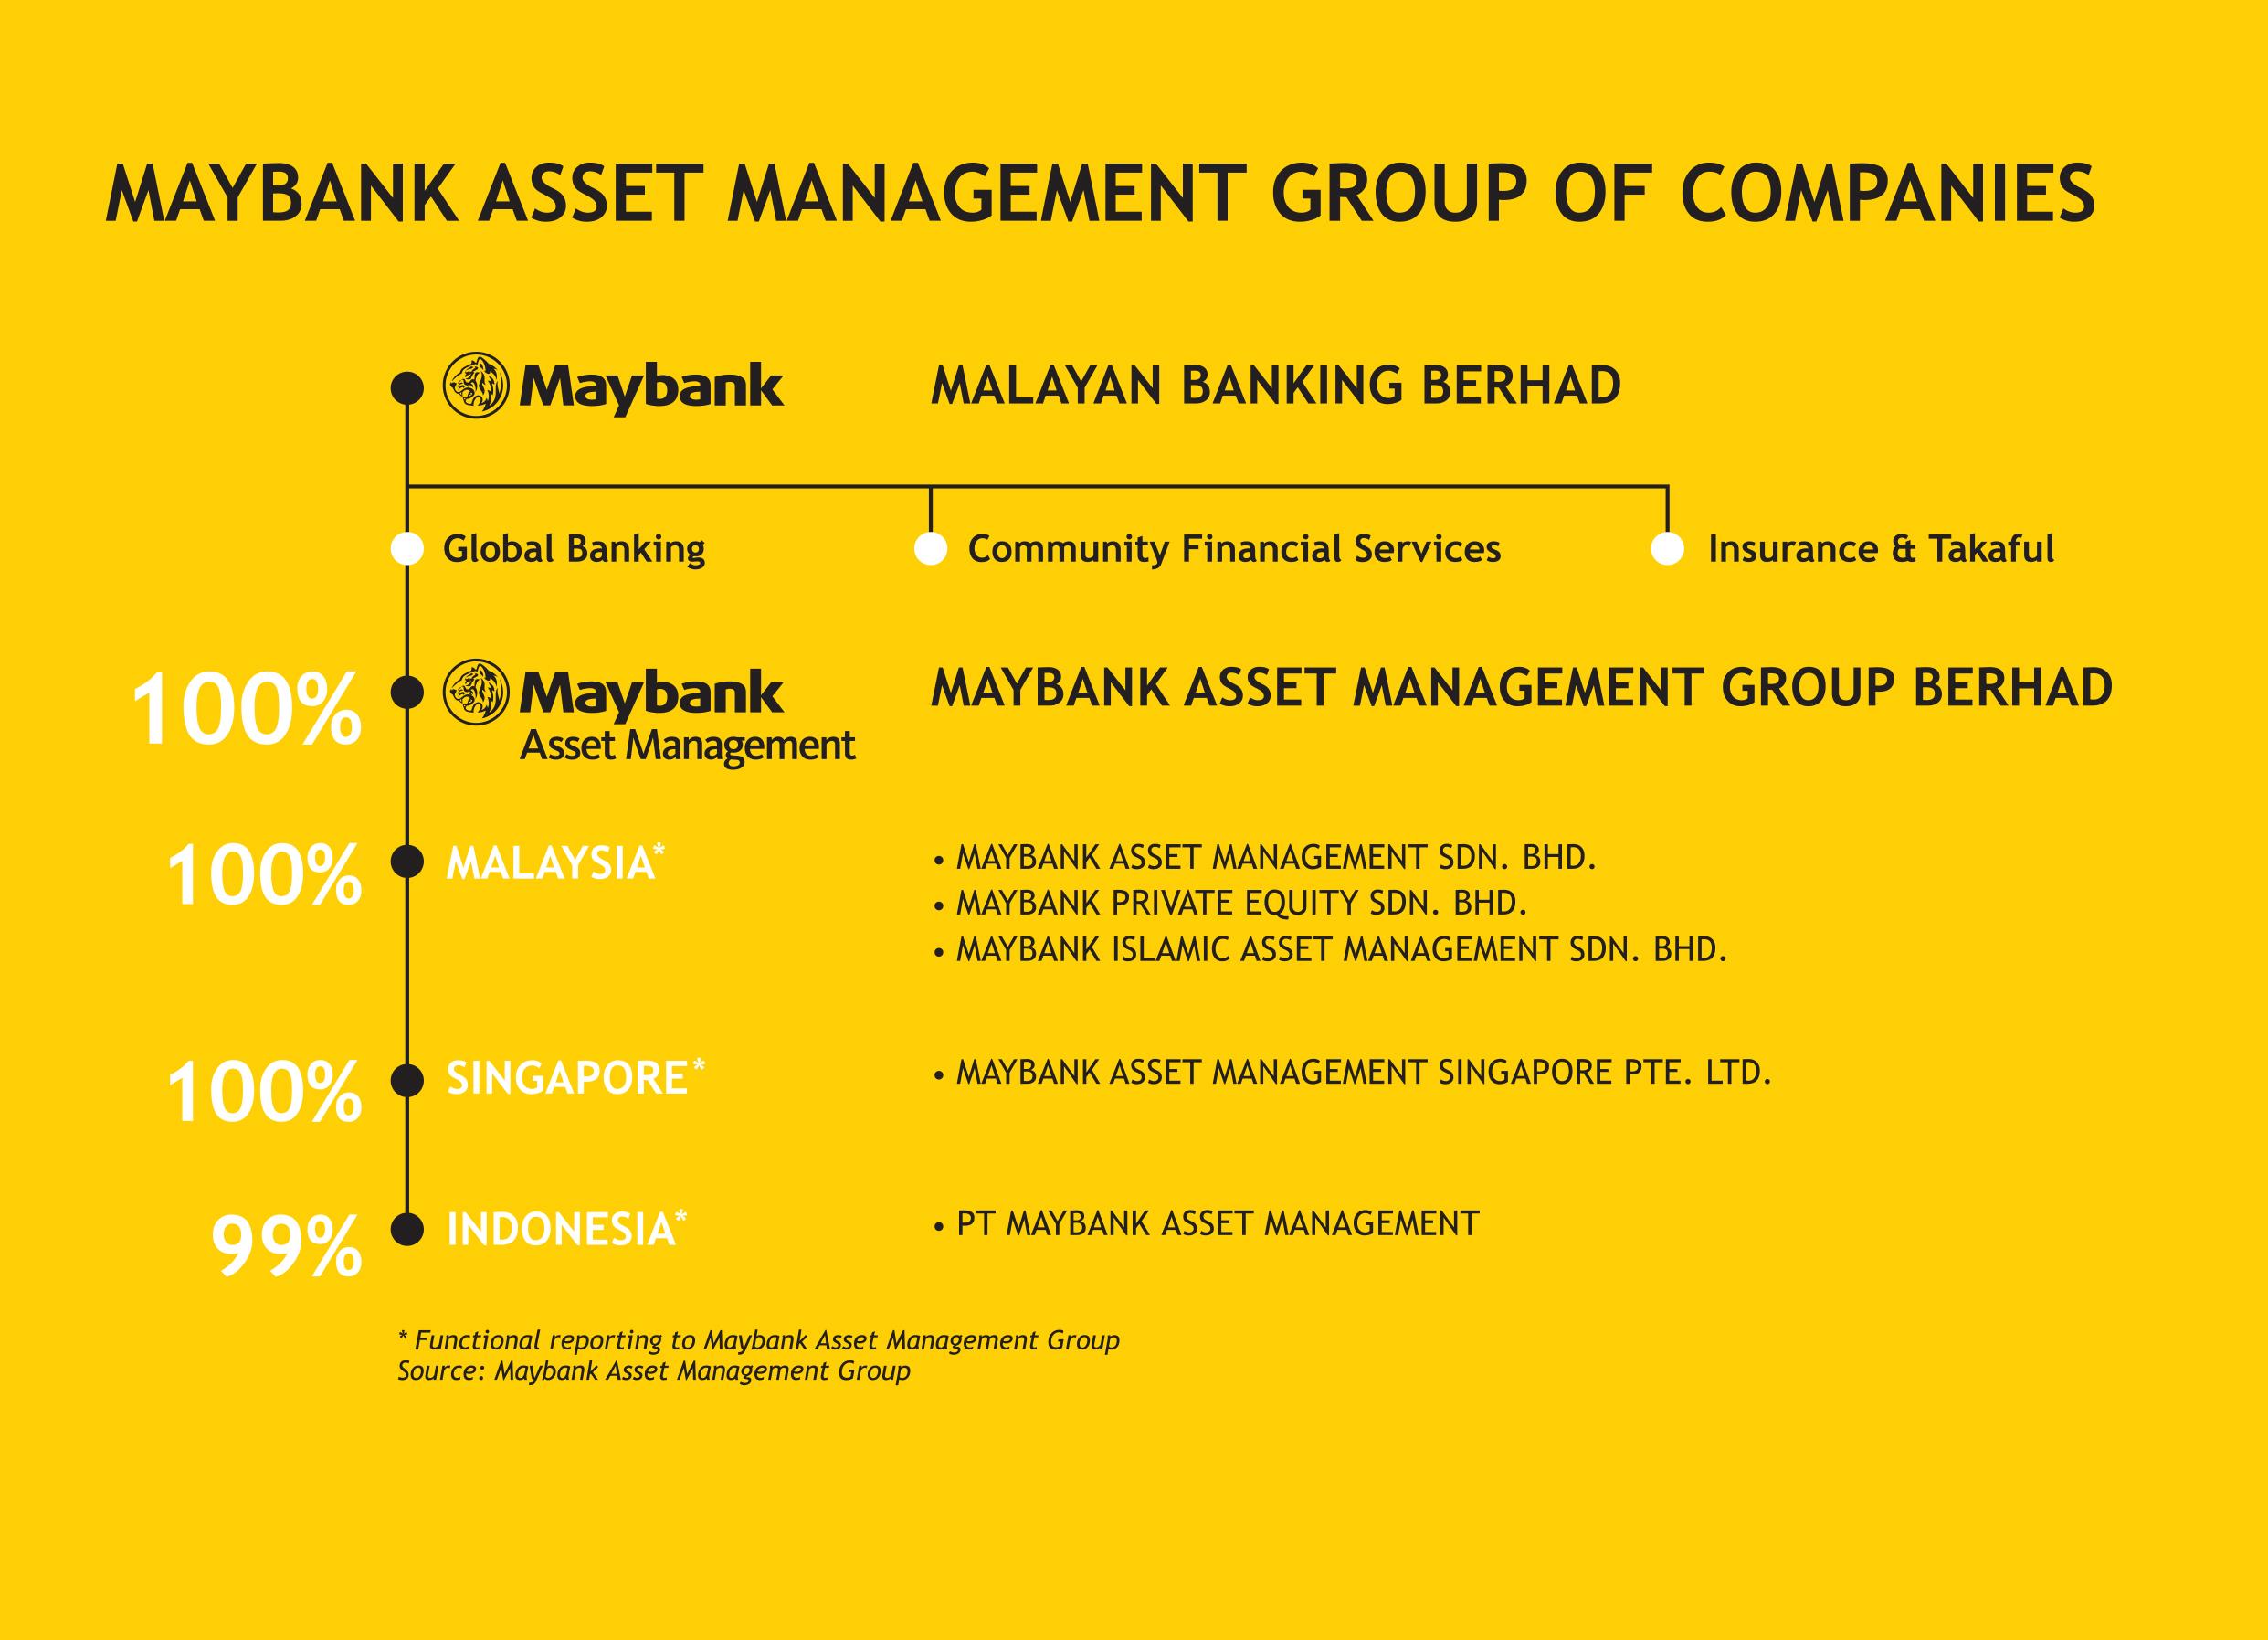 Maybank Asset Management